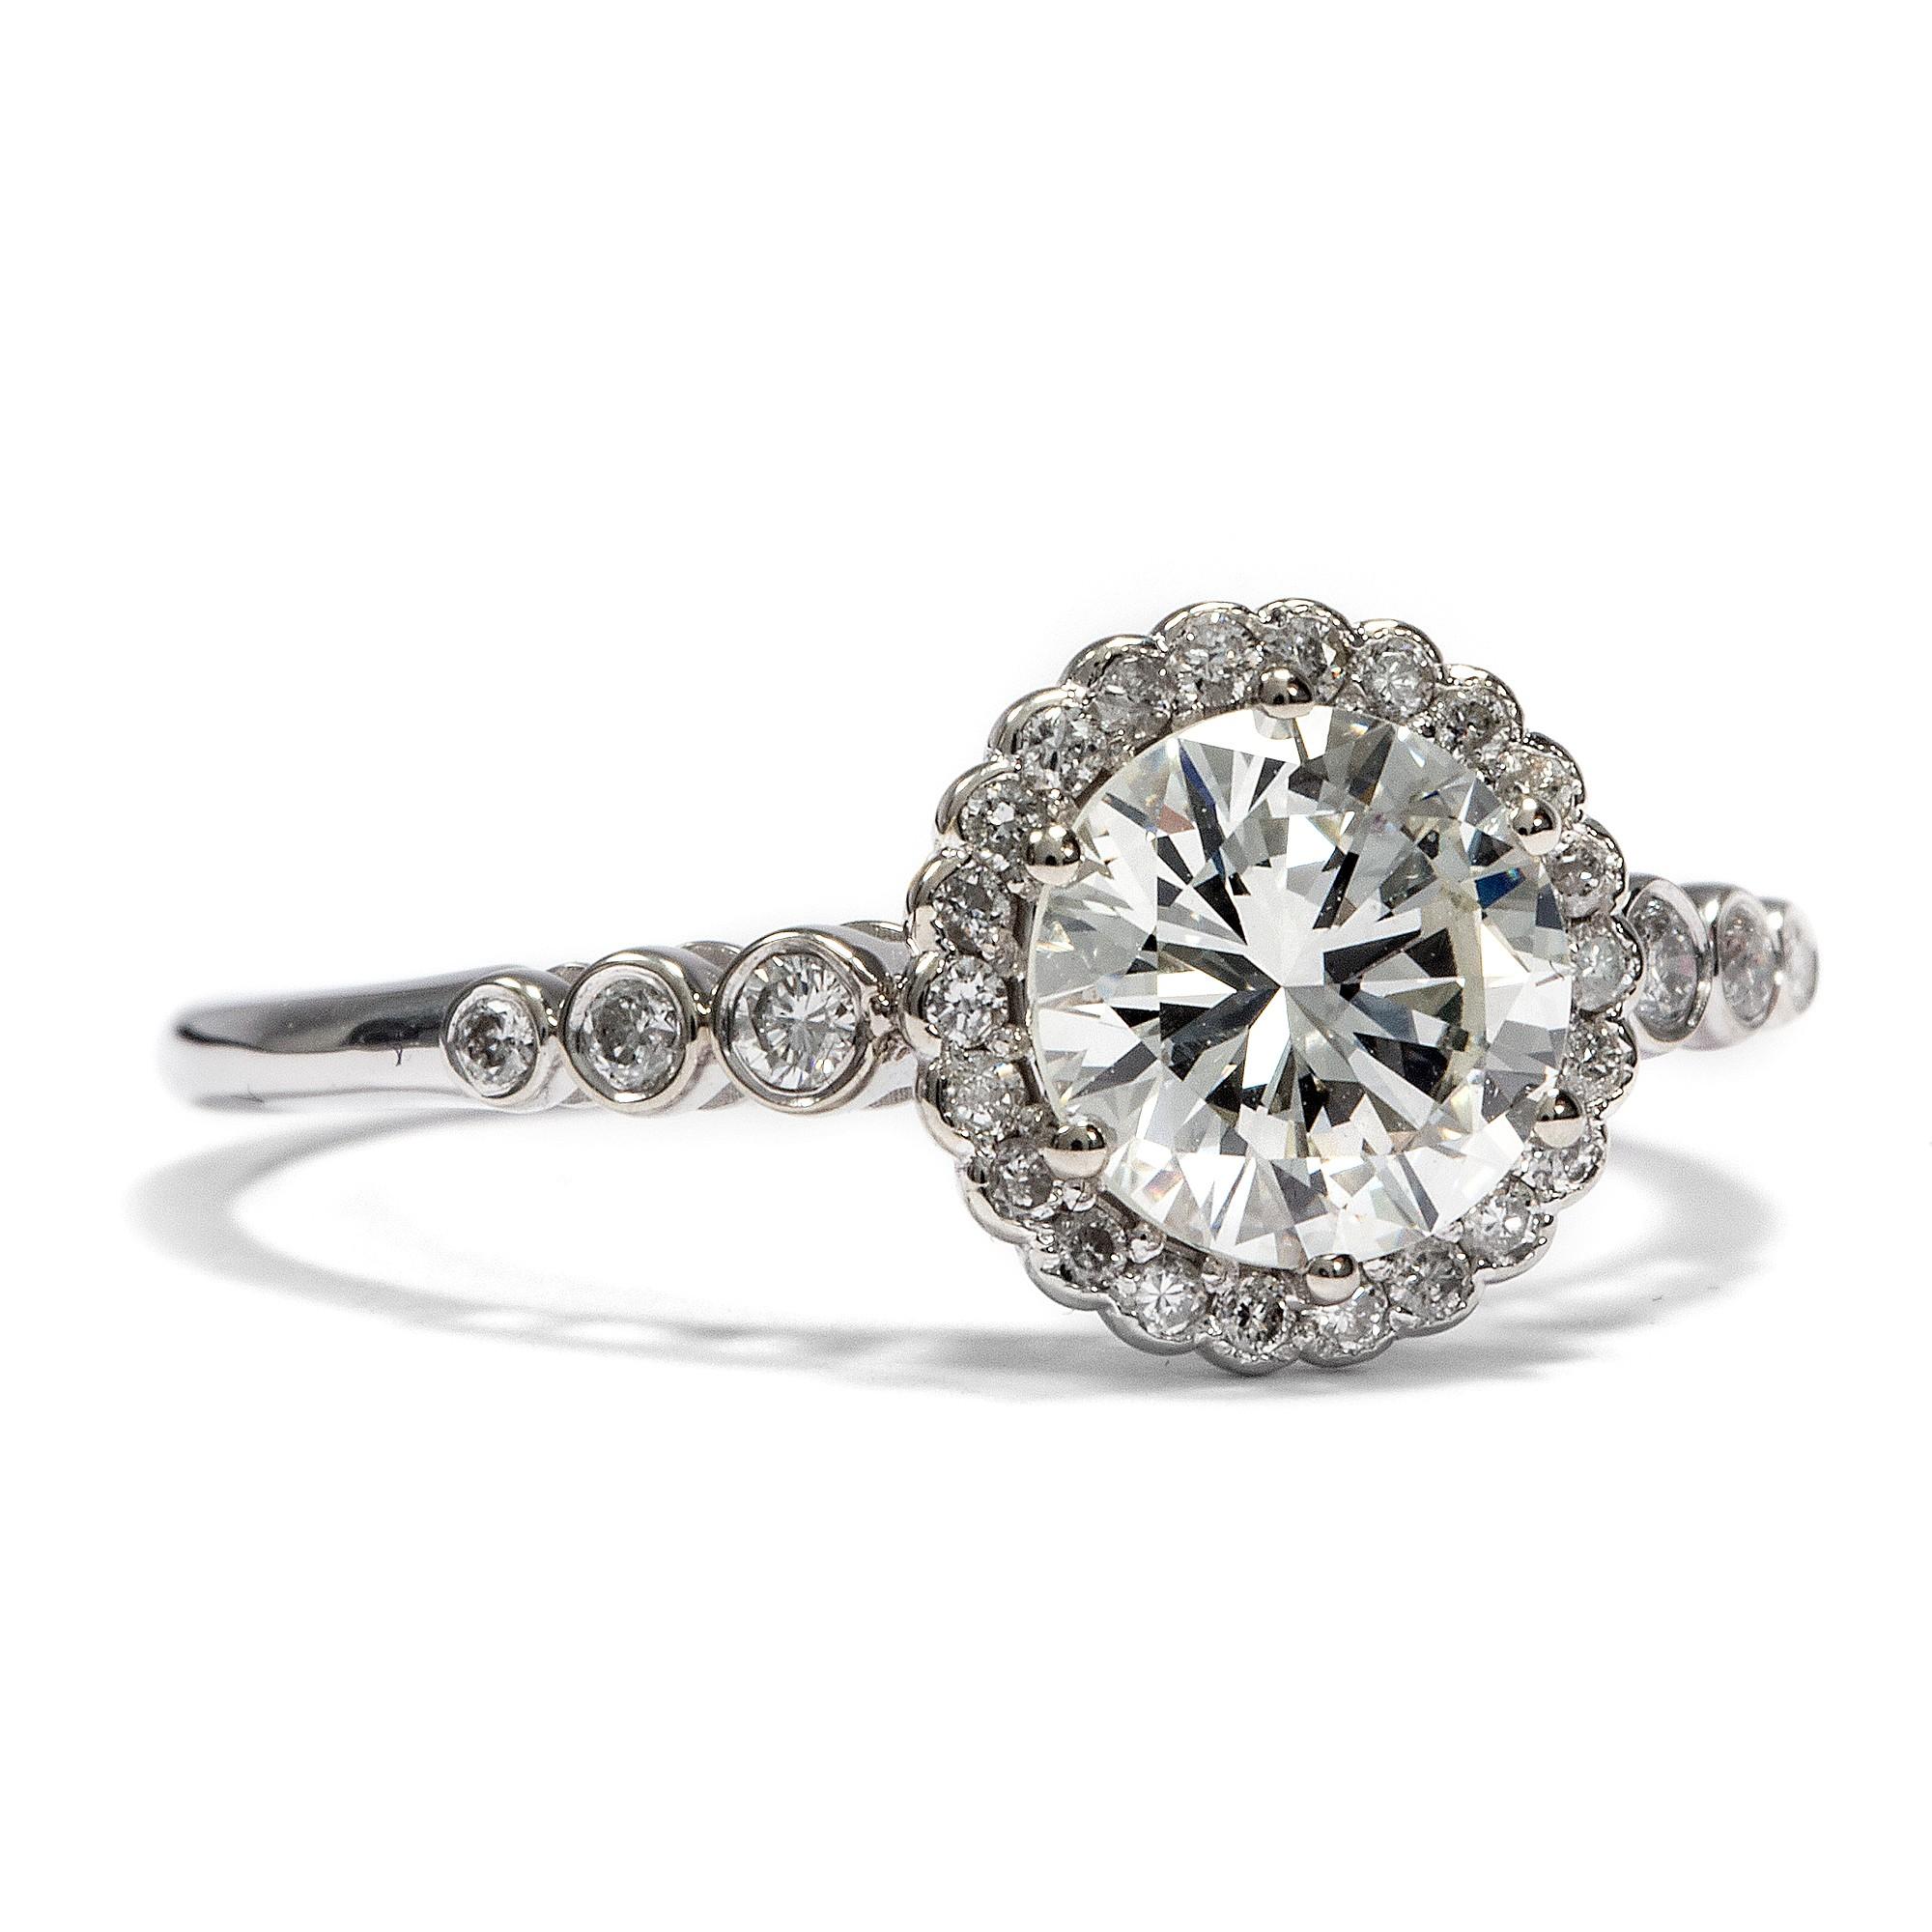 1 0 ct diamant solit r ring in 585 wei gold einkar ter brillant verlobungsring ebay. Black Bedroom Furniture Sets. Home Design Ideas